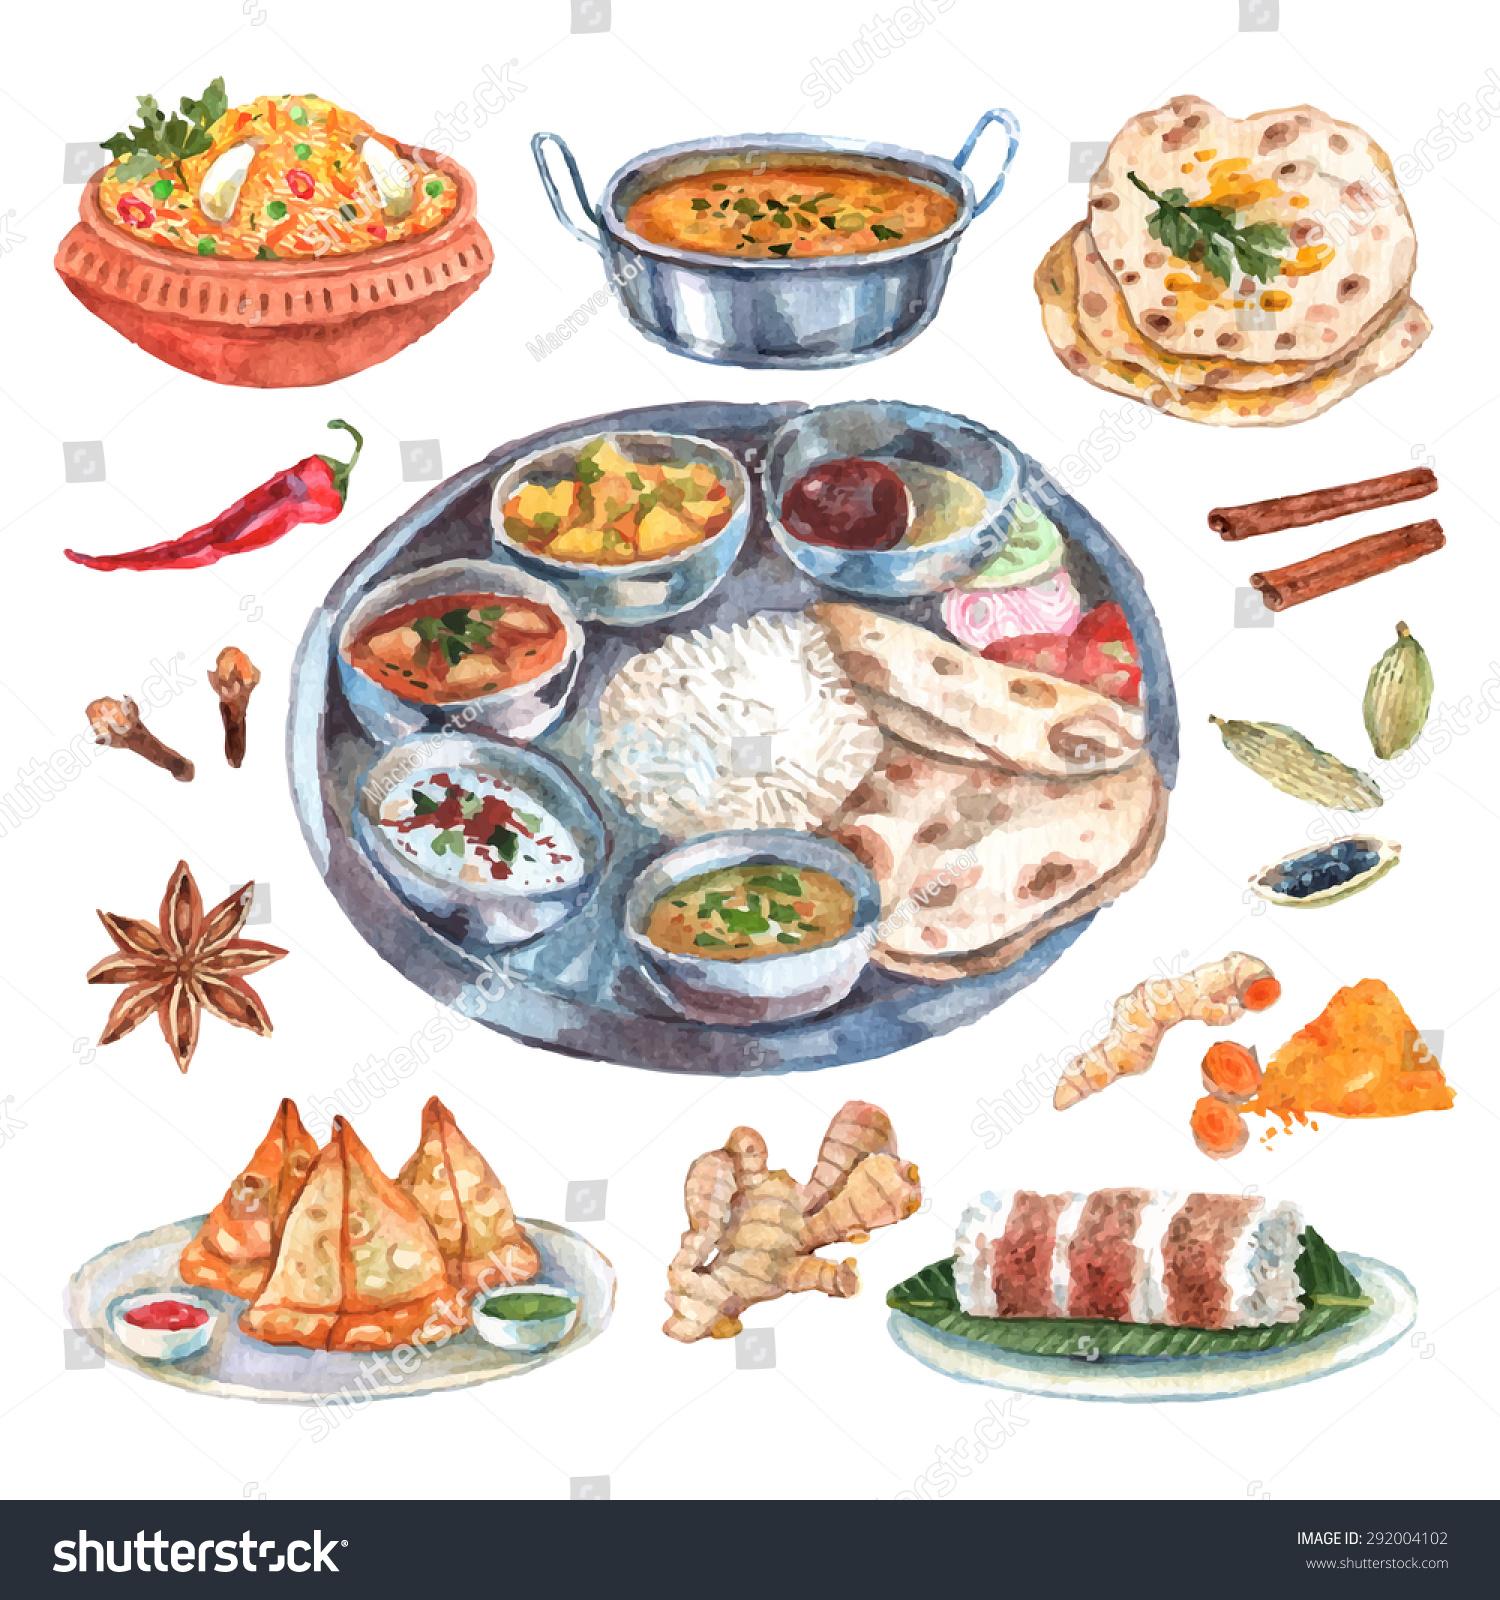 traditional indian cuisine restaurant food ingredients stock vector 292004102 shutterstock. Black Bedroom Furniture Sets. Home Design Ideas